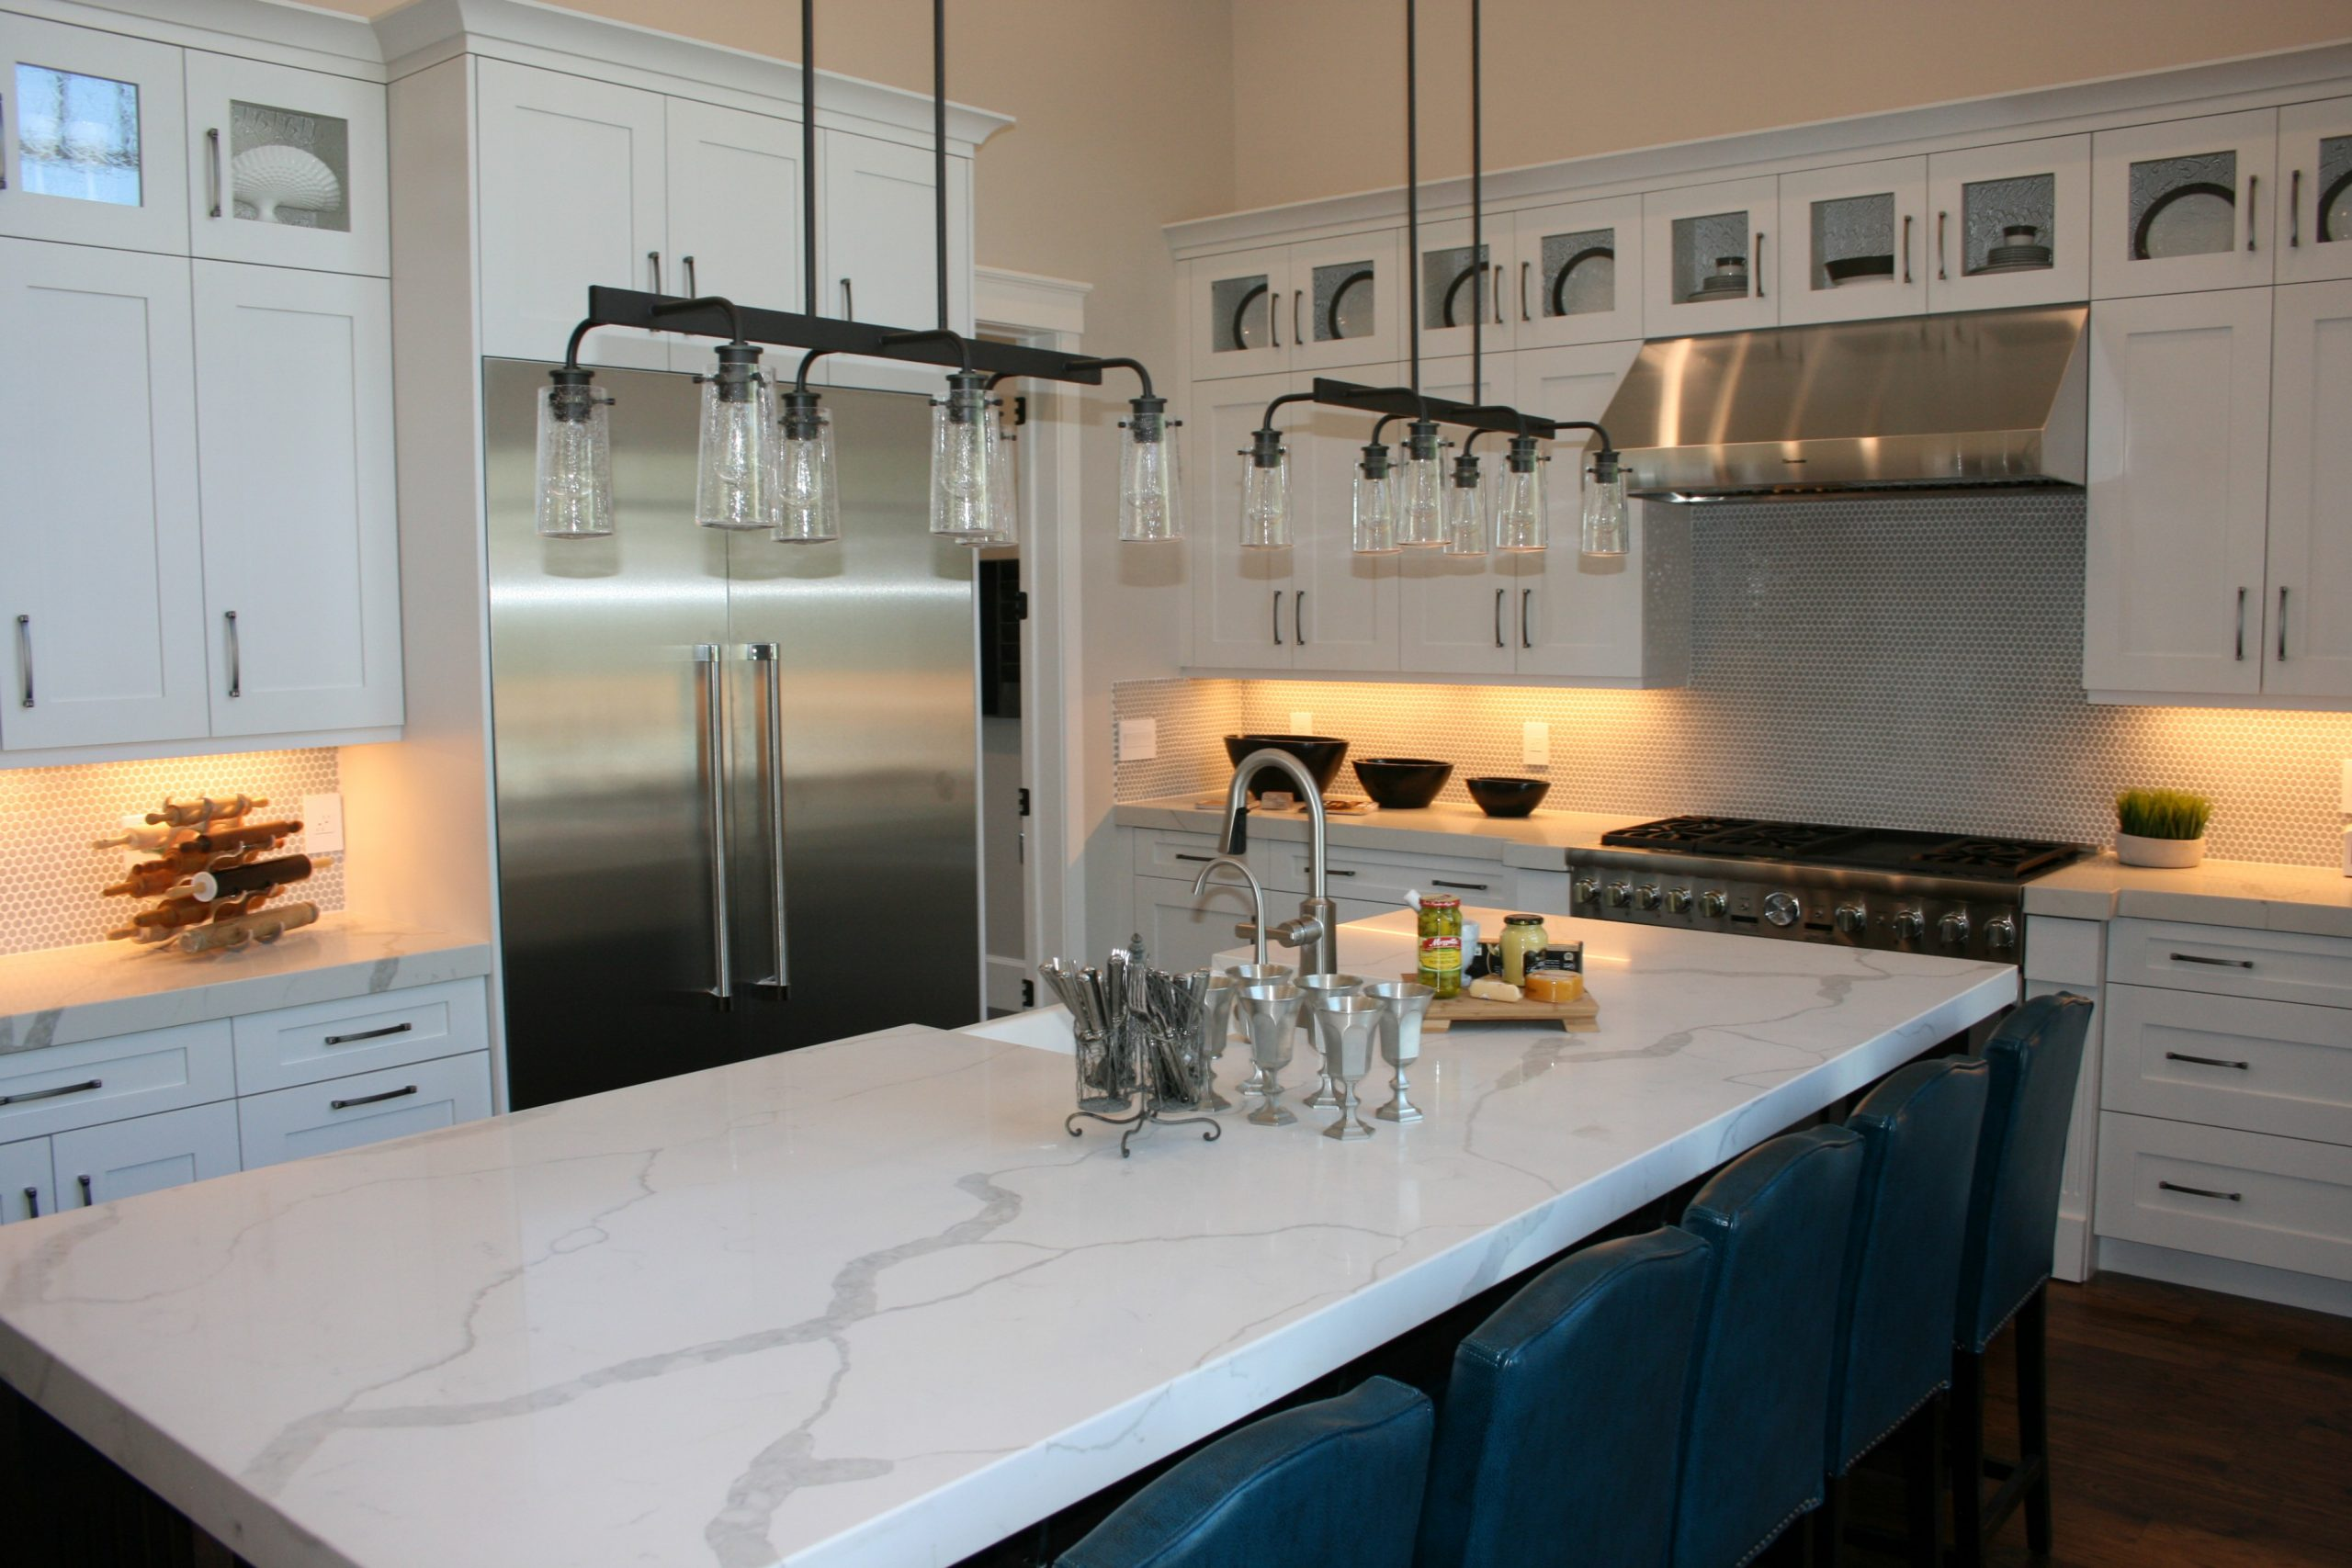 Kitchen Cabinet Weight Capacities - Kitchen Cabinet Maximum Weight